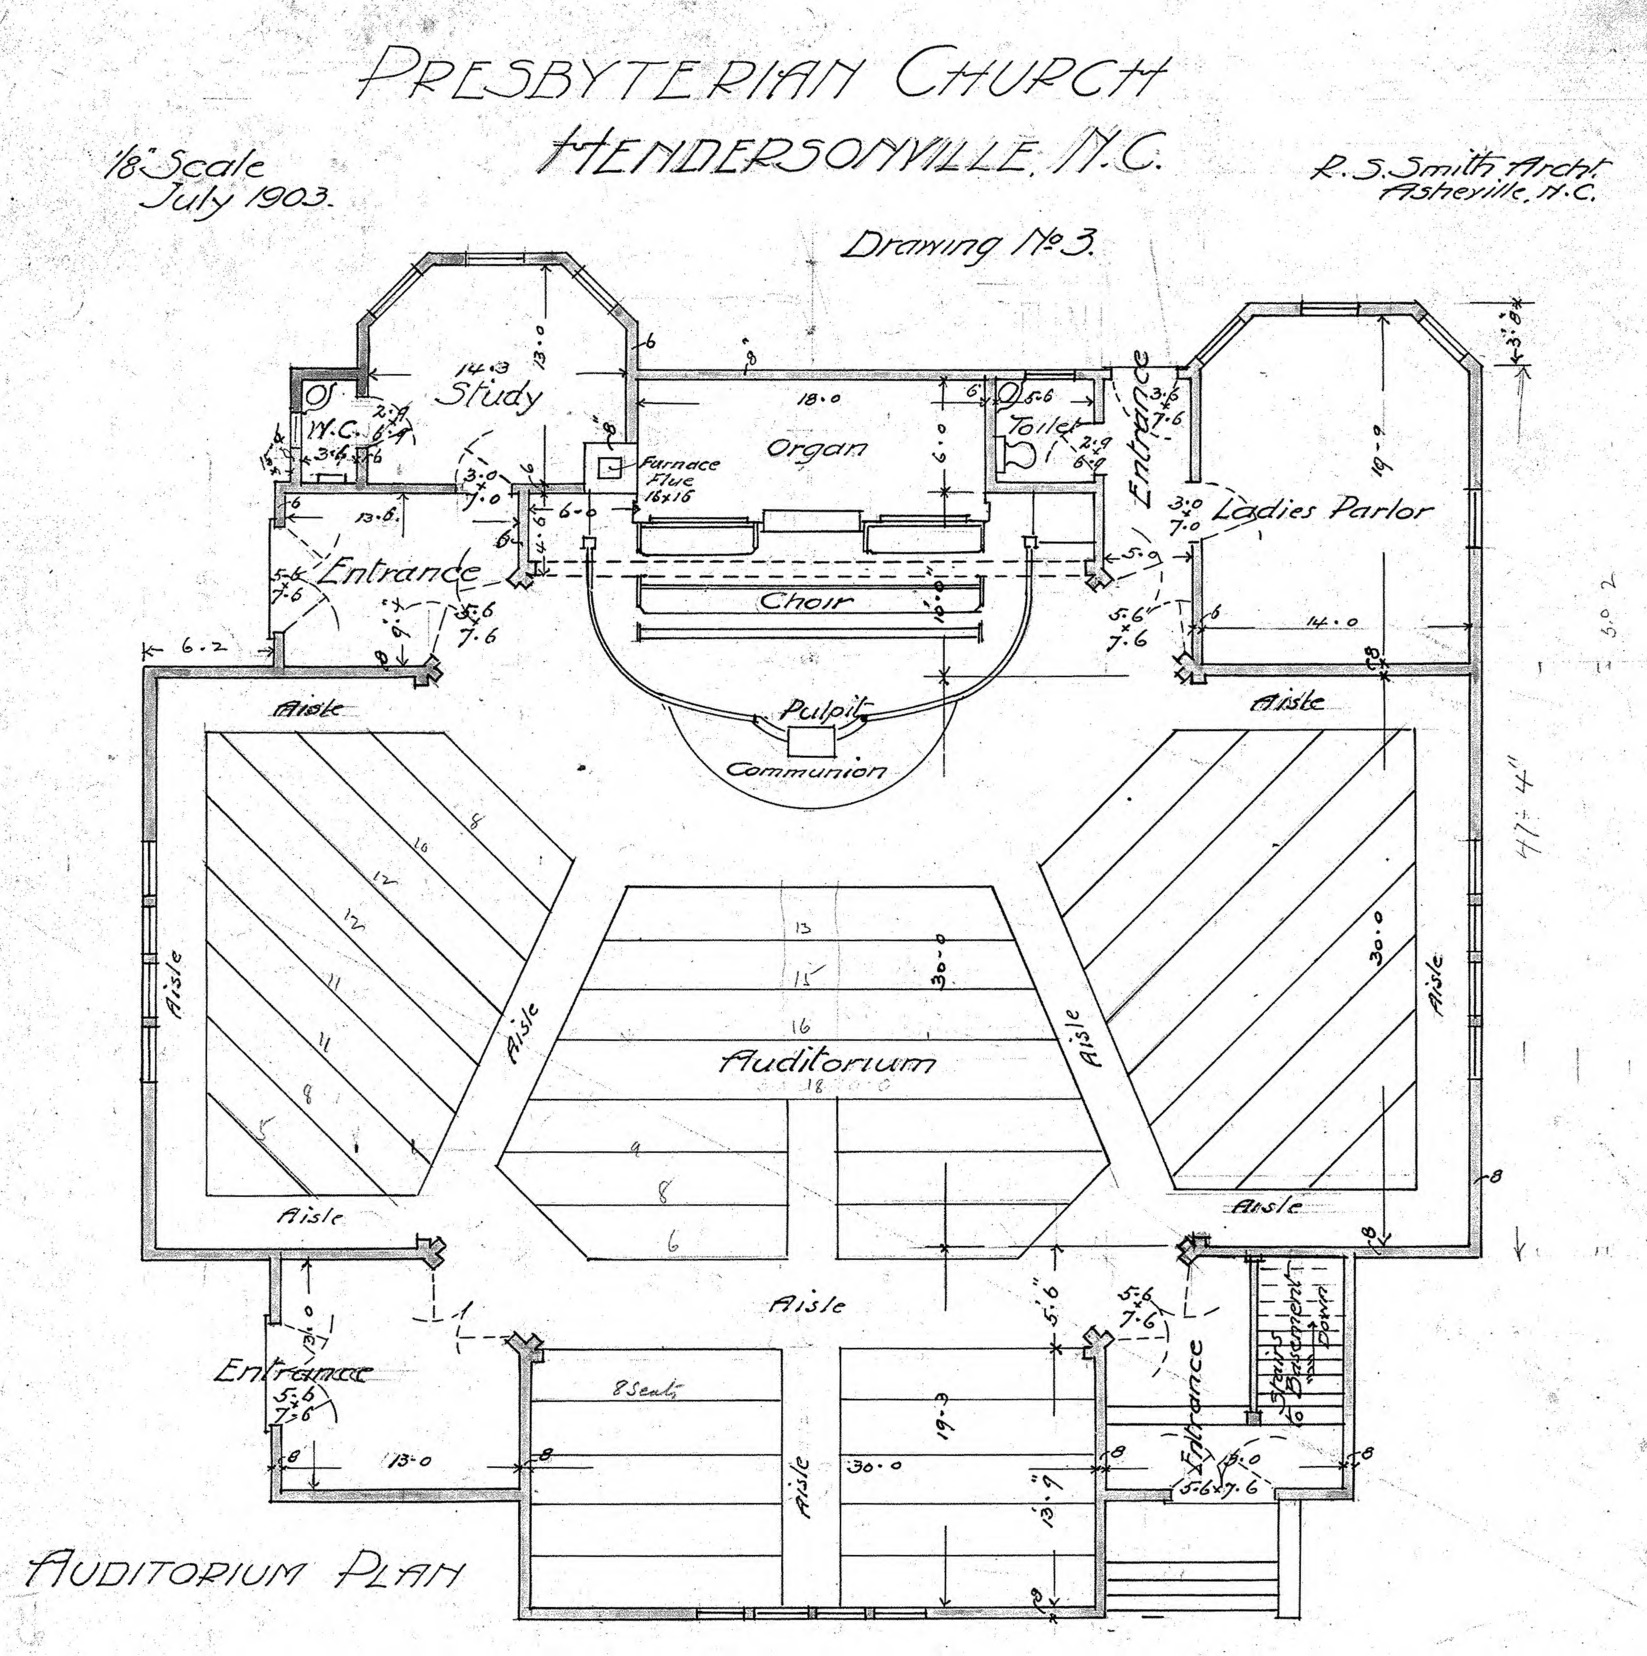 Church Auditorium Drawings Church--auditorium Plan